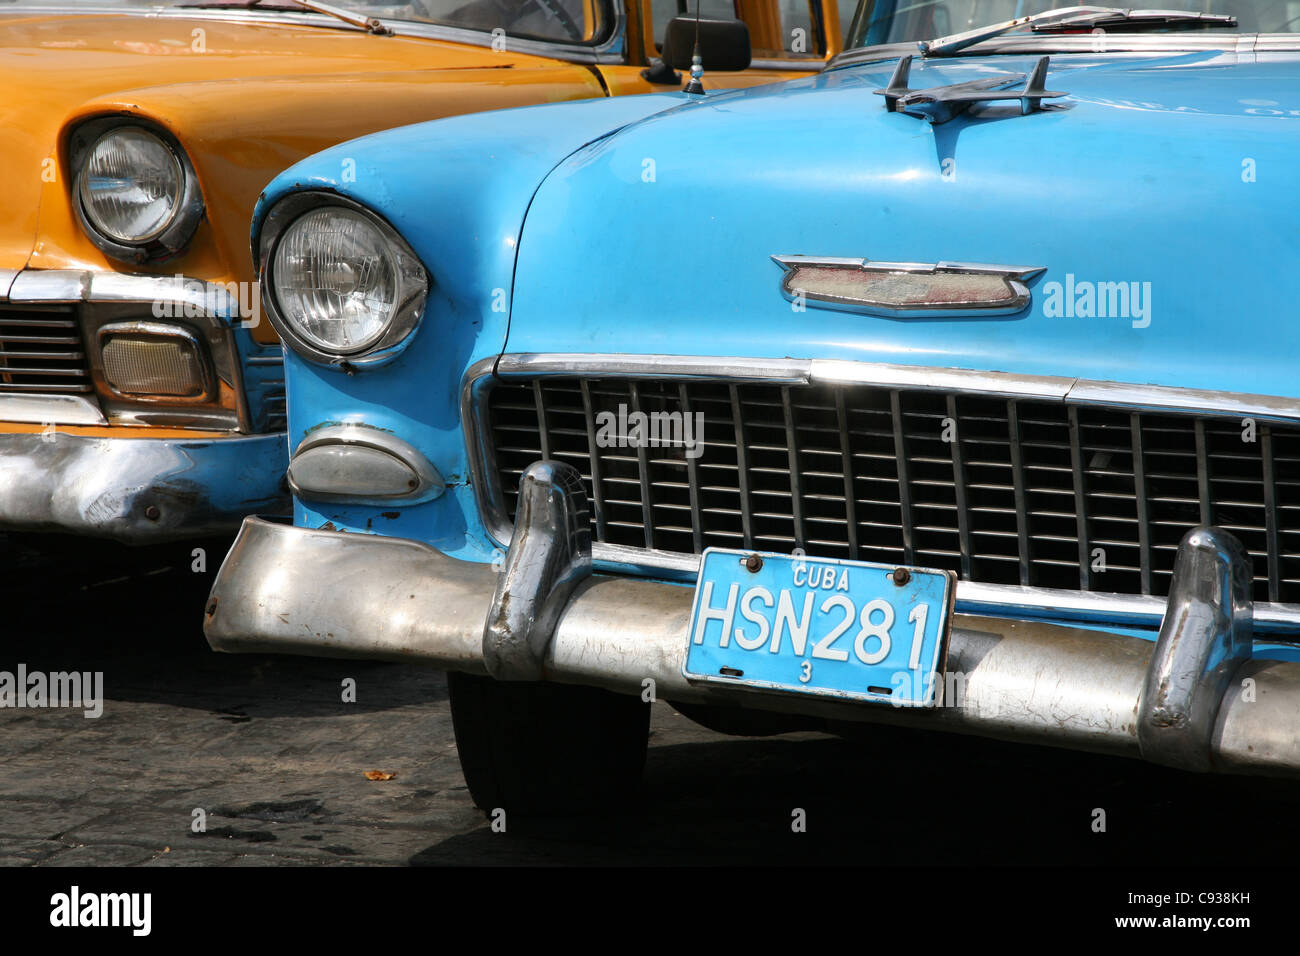 Oldtimer Chevrolet parkte neben der nationalen Capitol am Paseo del Prado in Havanna, Kuba. Stockbild